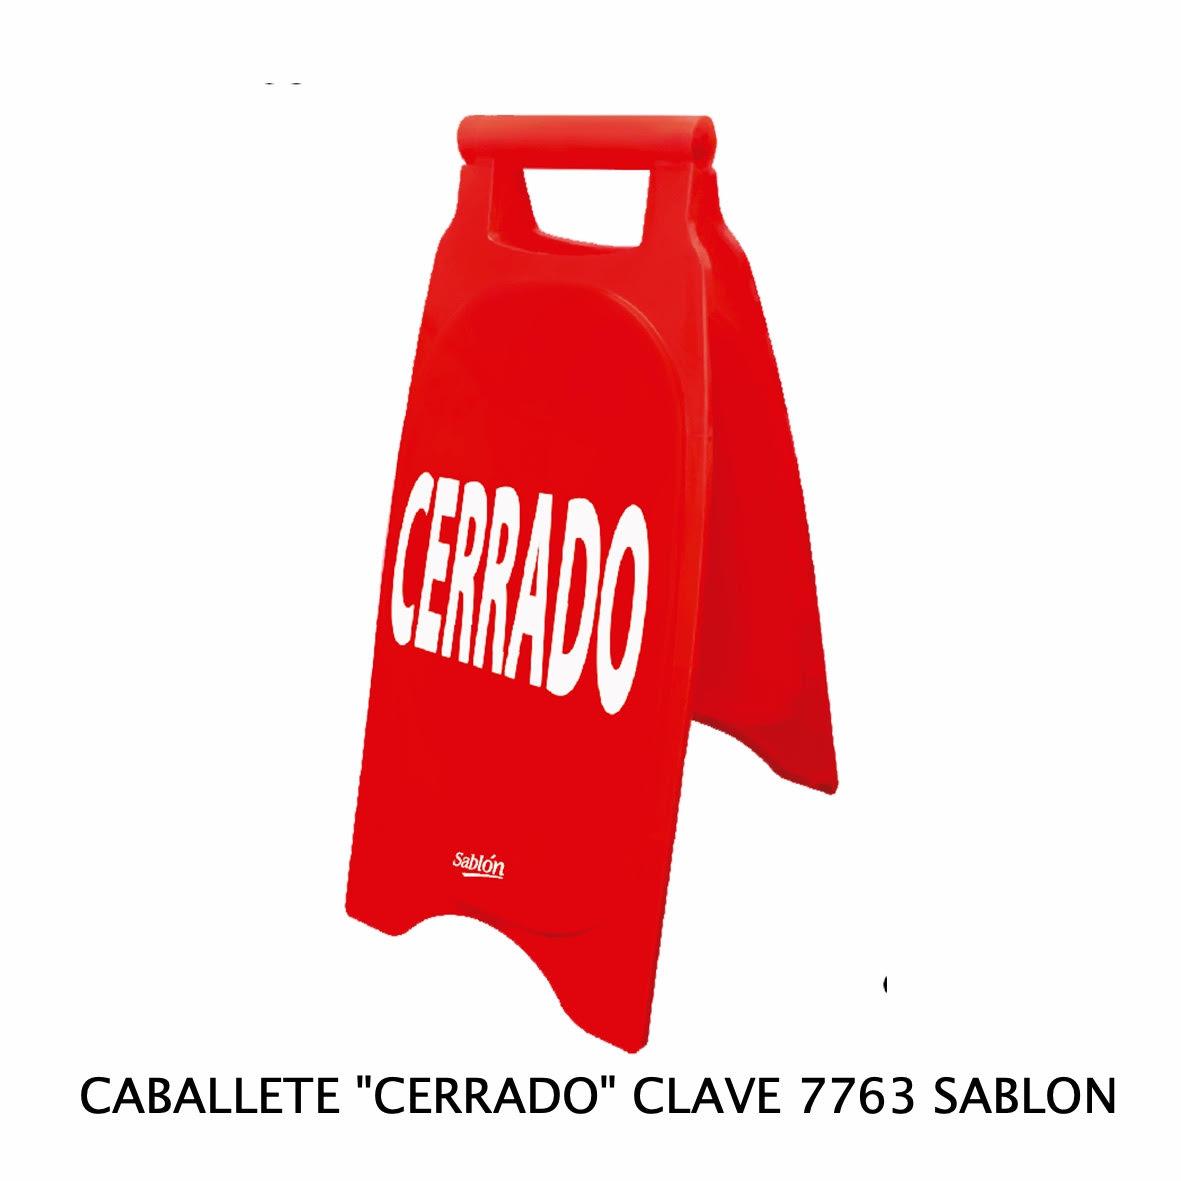 Caballete con señal CERRADO Clave 7763 de Sablón